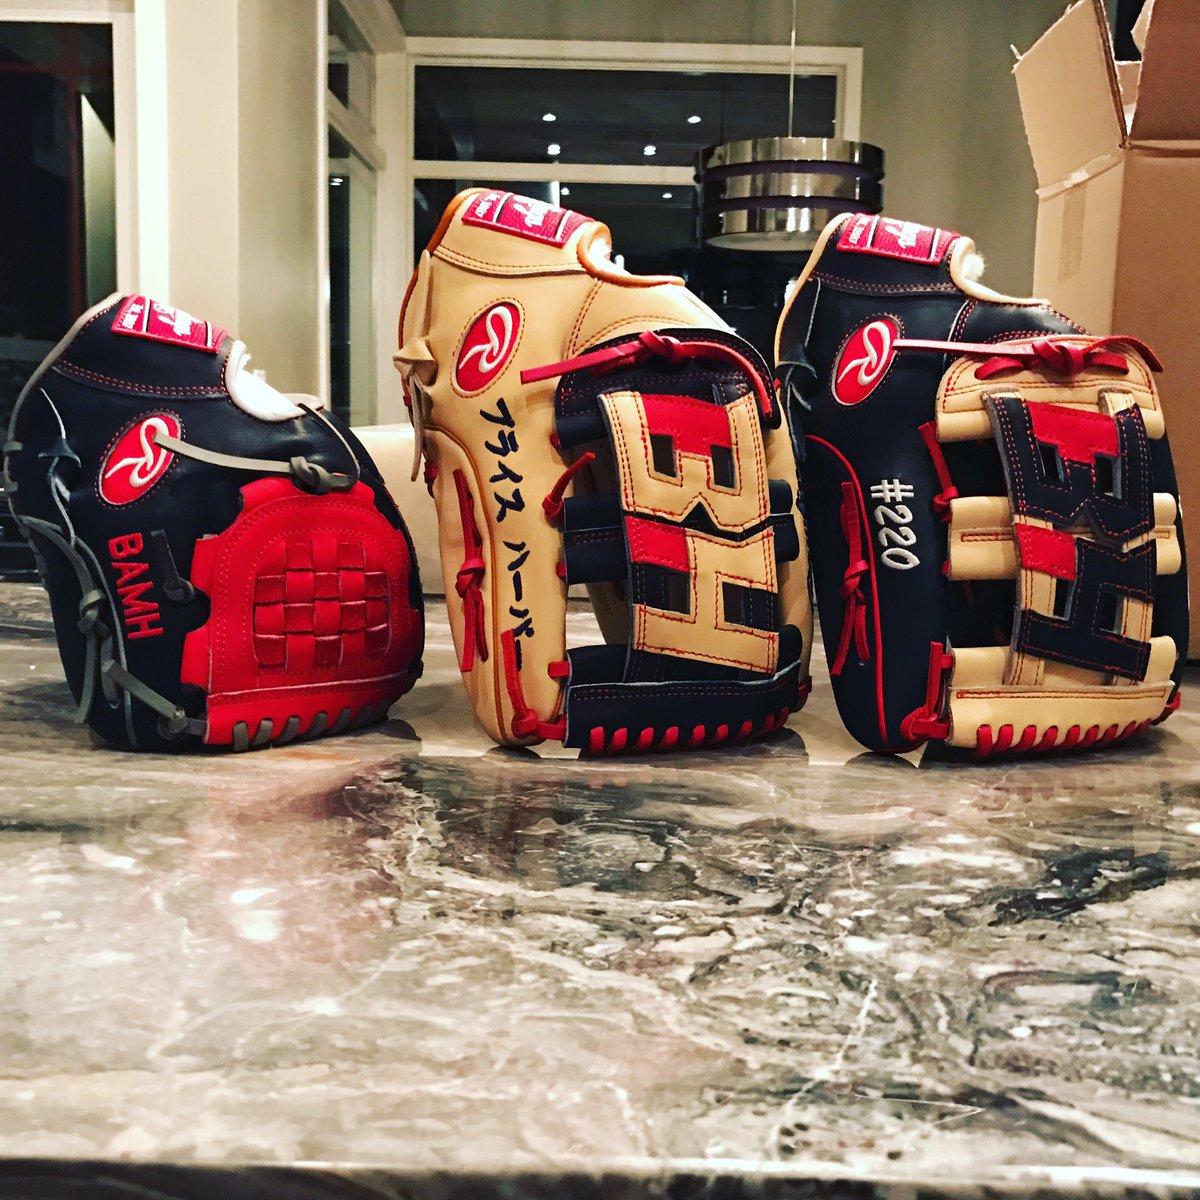 Bryce Harper Glove 2017